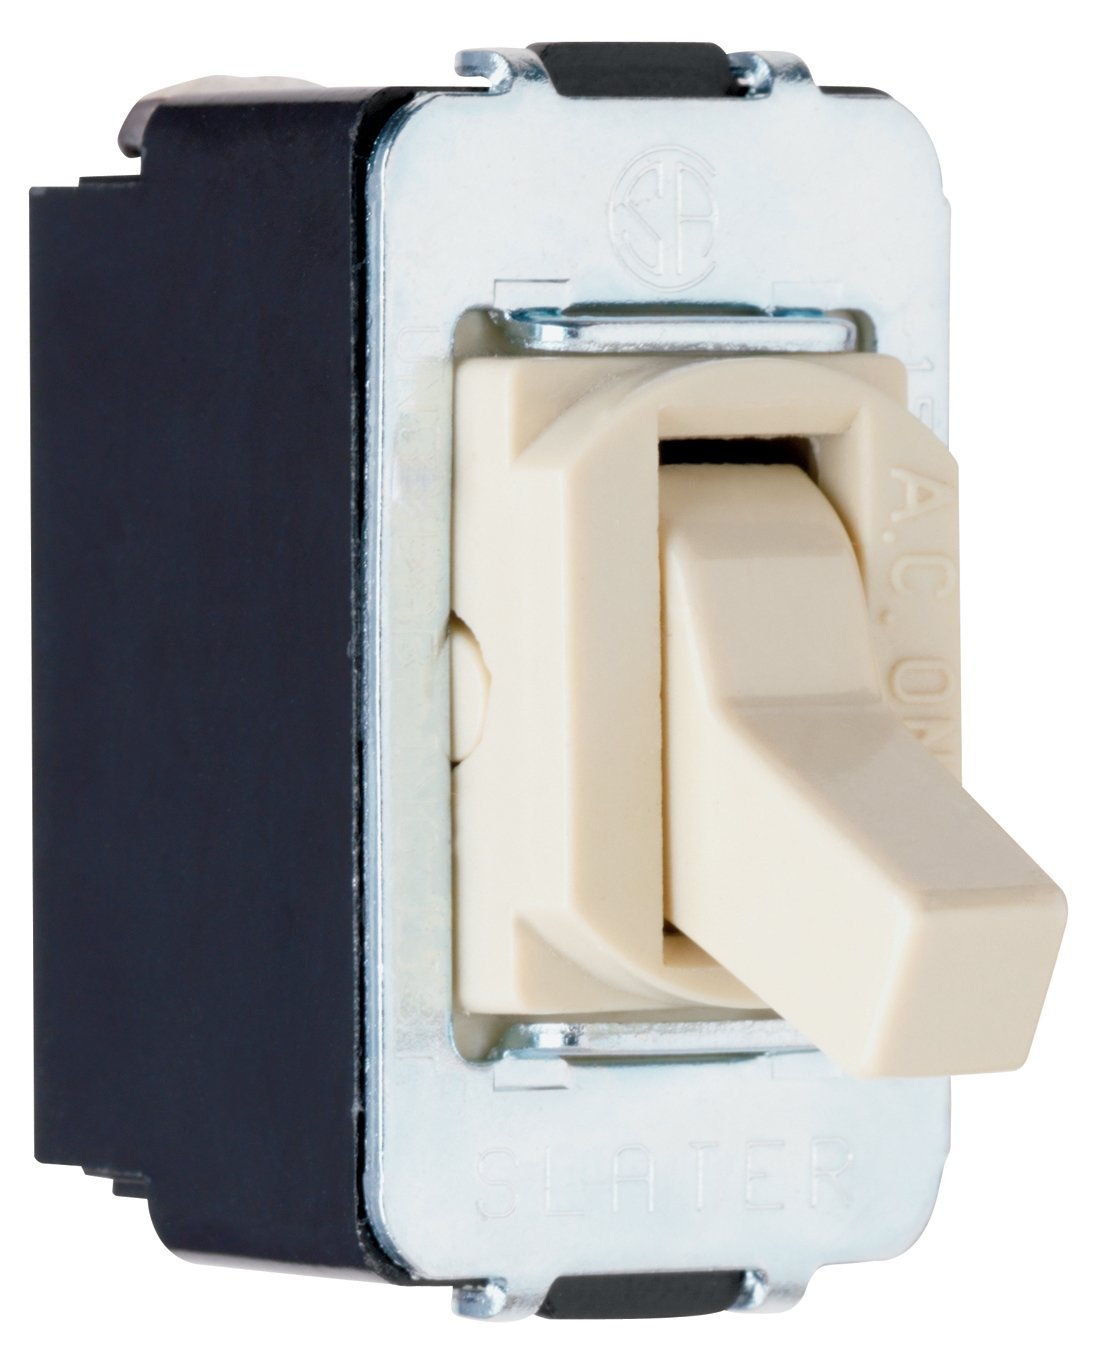 Legrand-Pass & Seymour ACD1ICC8 Despard Toggle Switch Single Pole 15 ...